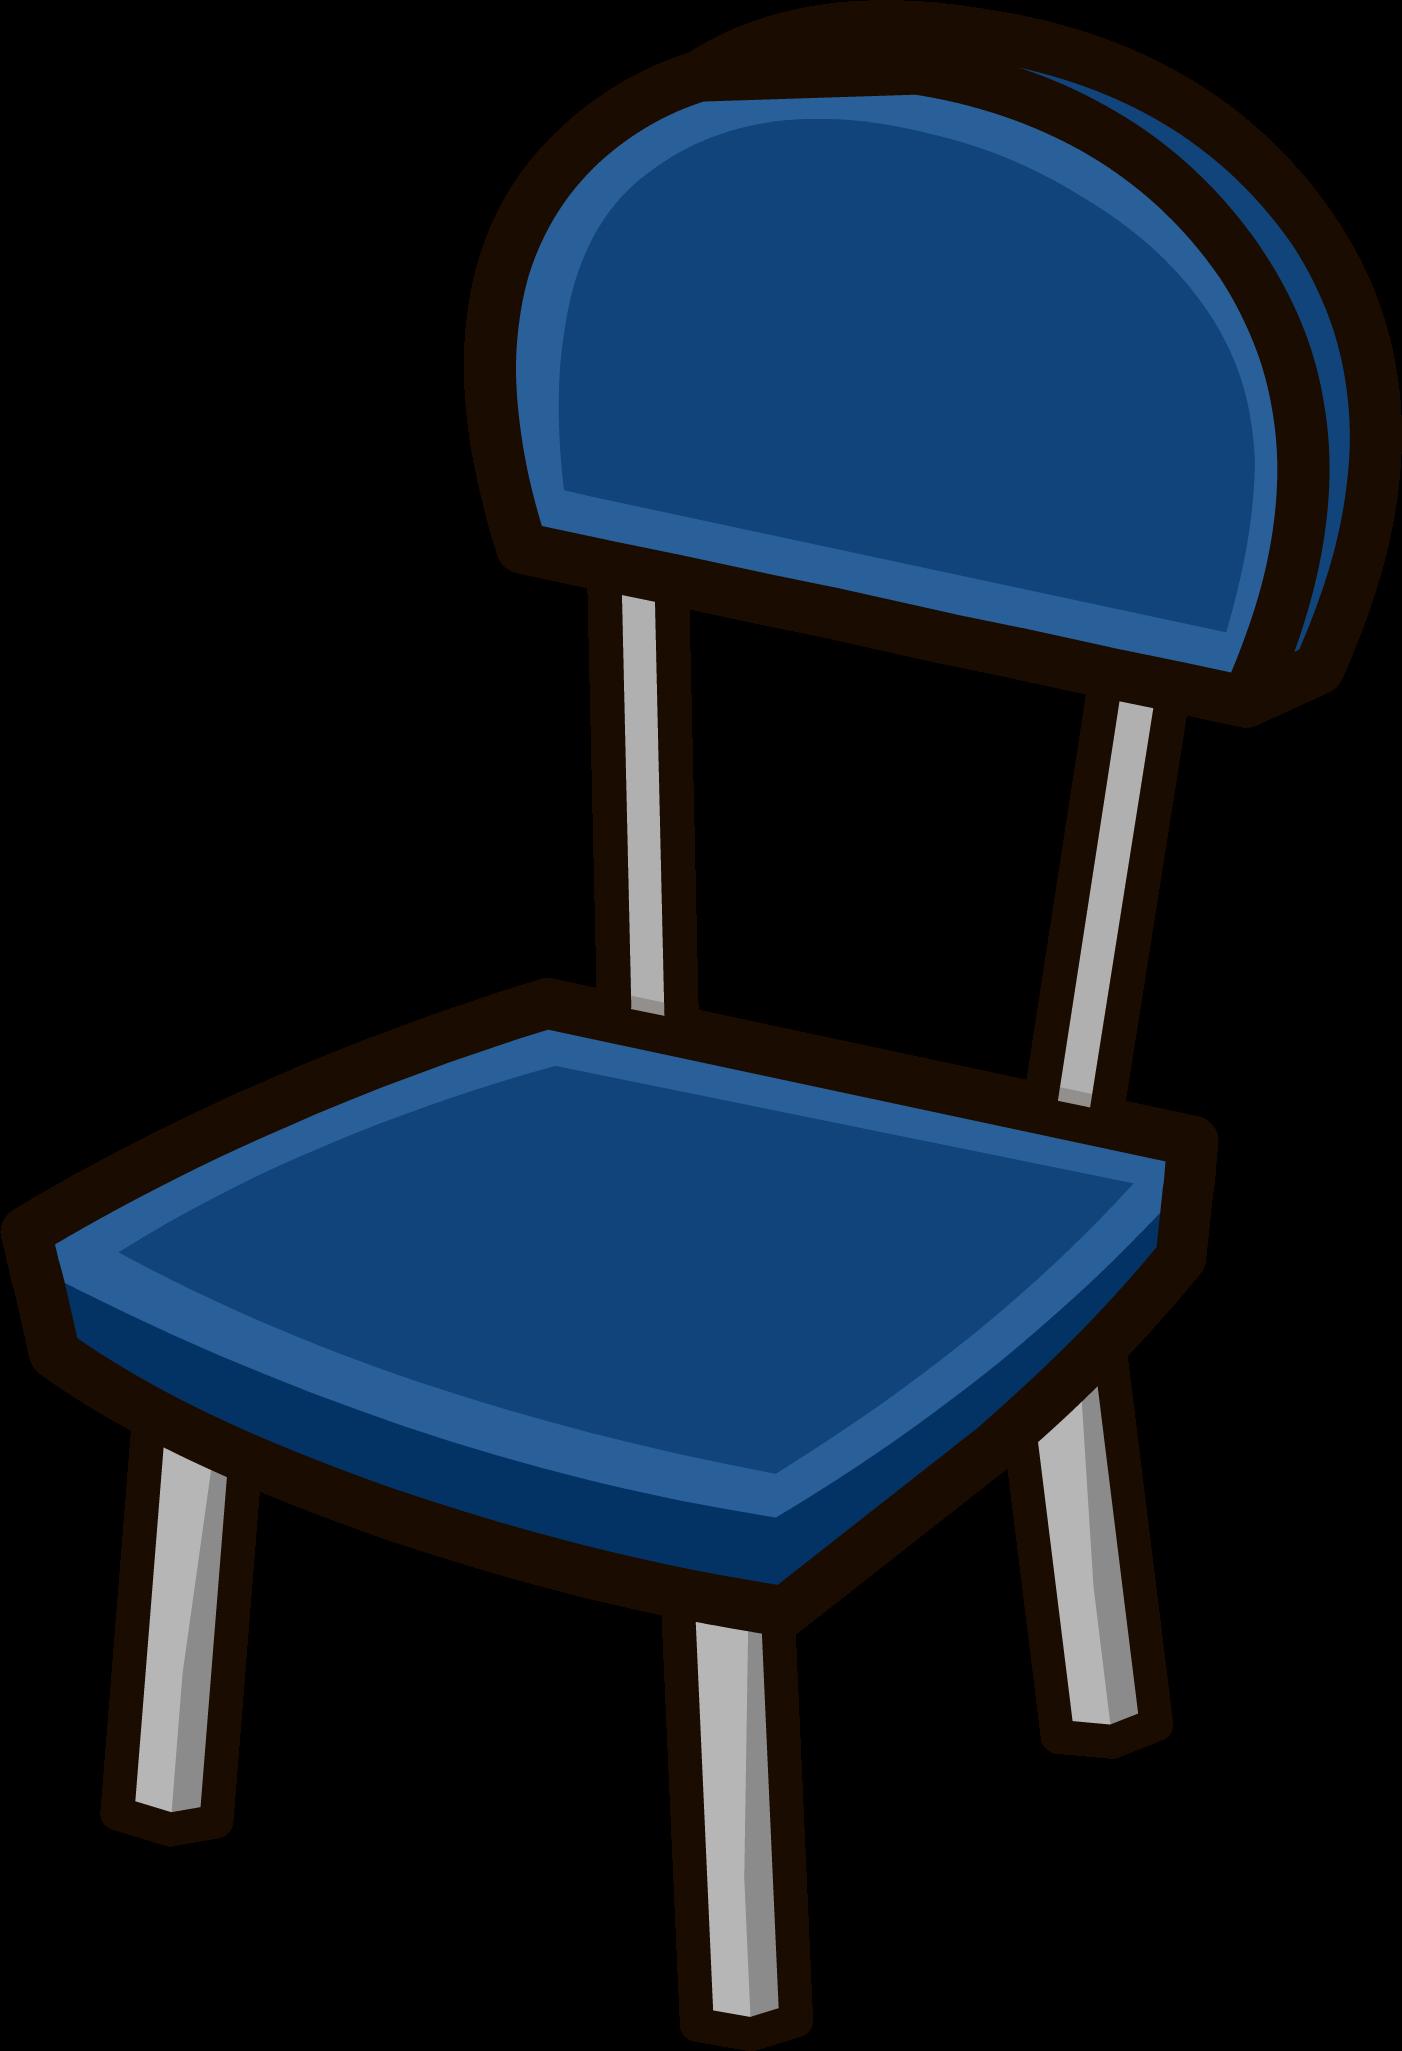 Clipart chair blue chair, Clipart chair blue chair.